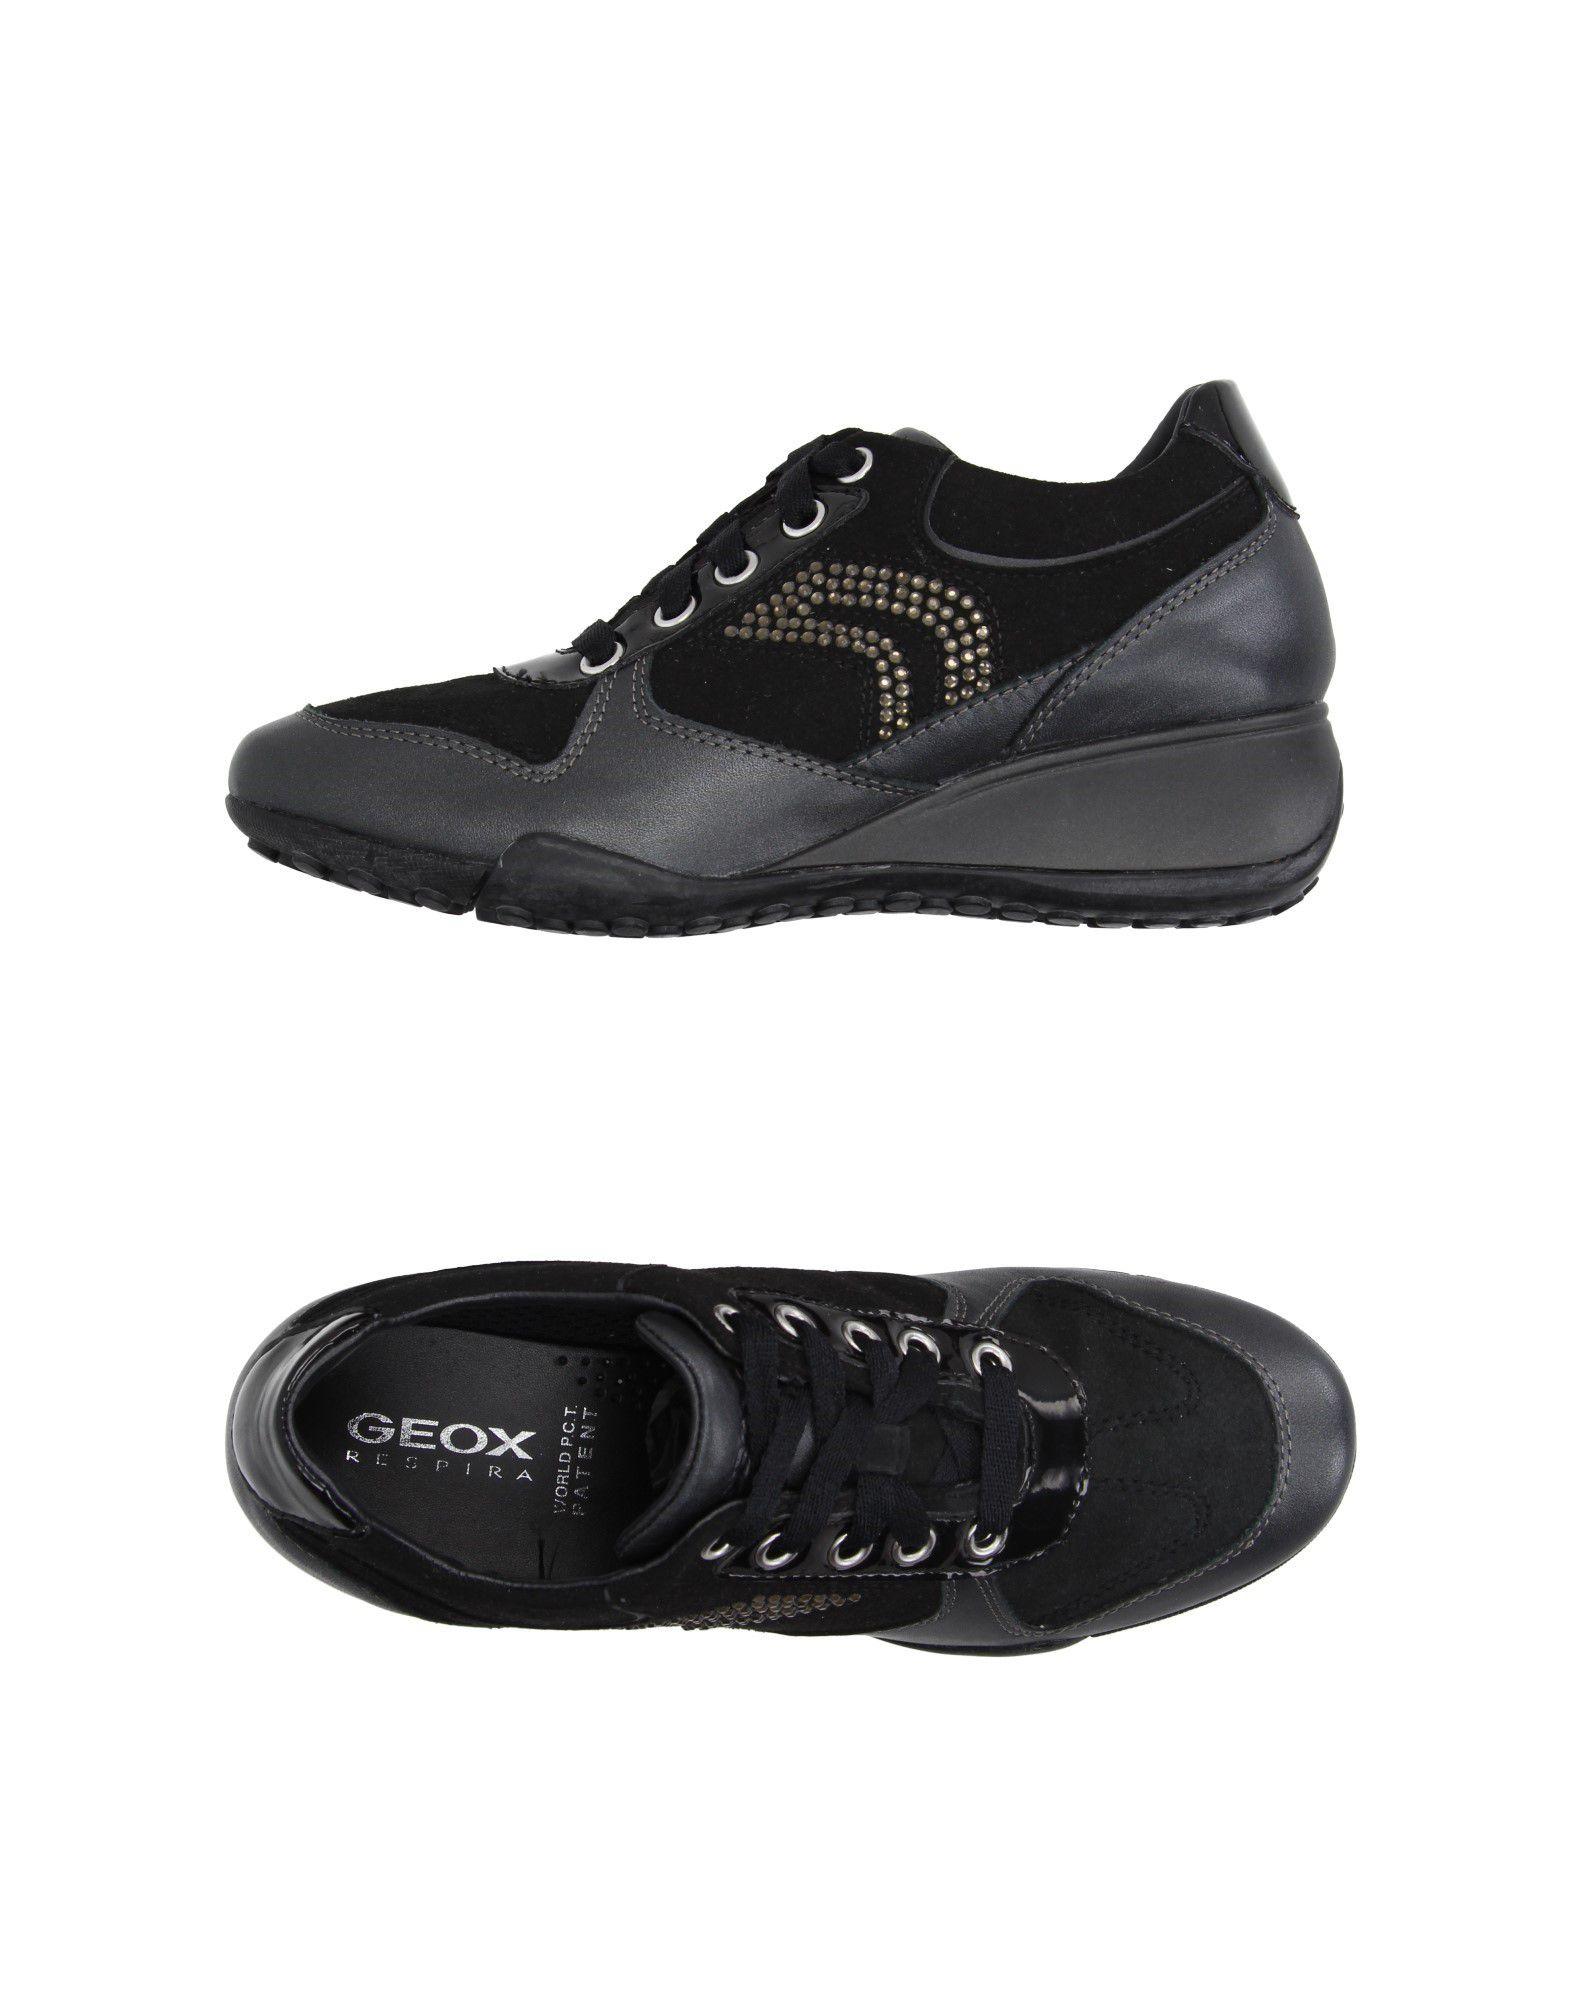 Geox Sneakers Sneakers Geox Damen  11021783BR 6986f6